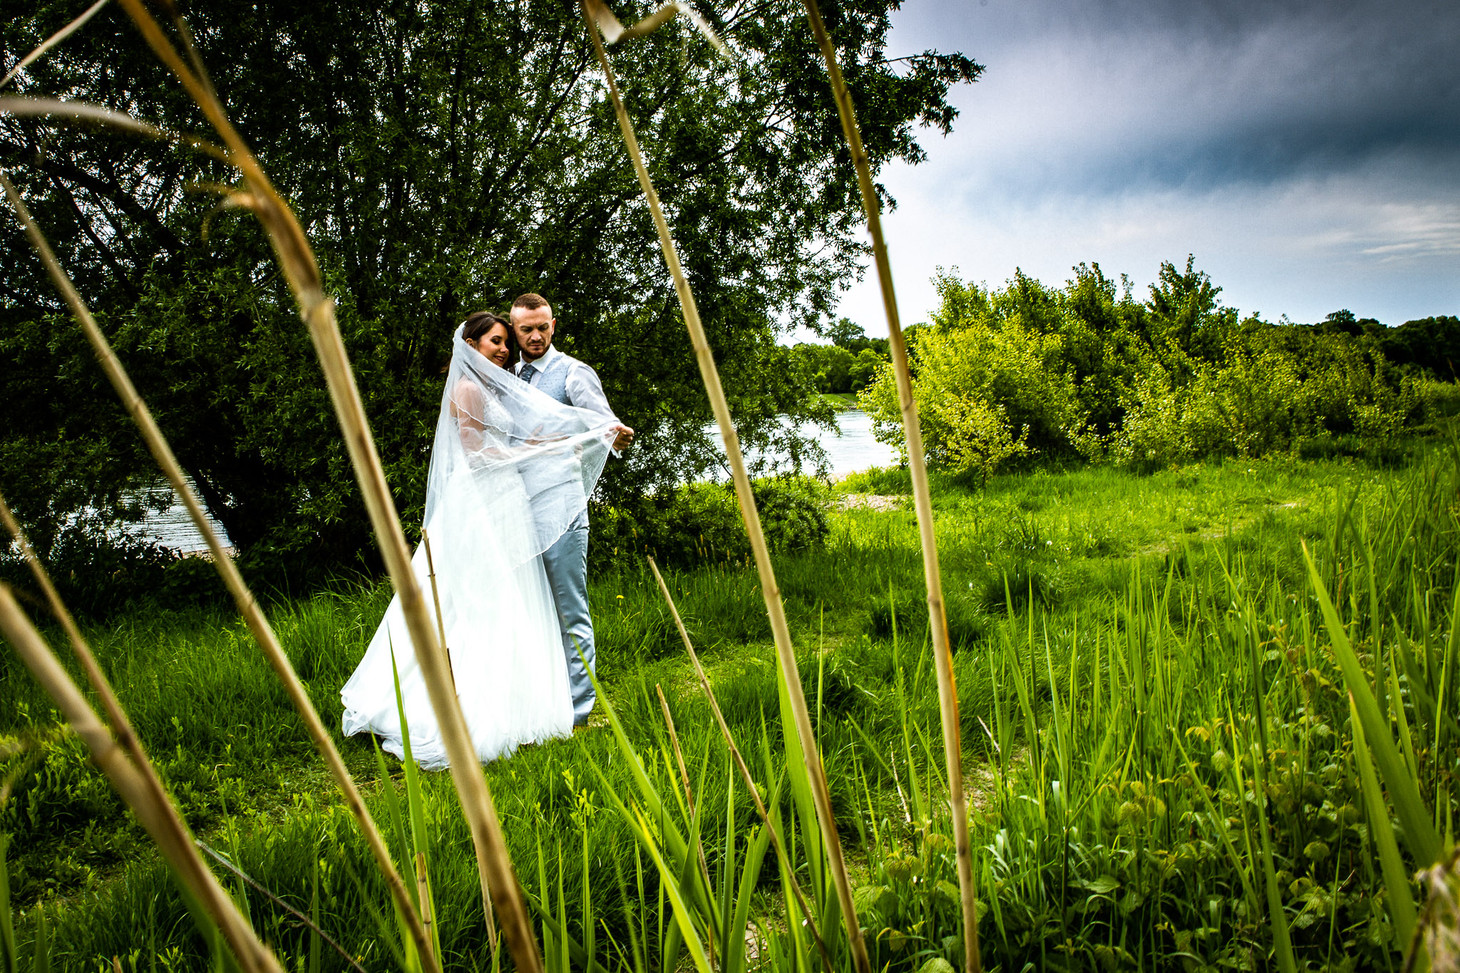 Brautpaar im Gras. Parkinsel - Stadtpark Ludwigshafen. Photo made by Willi Lasarenko Photography.